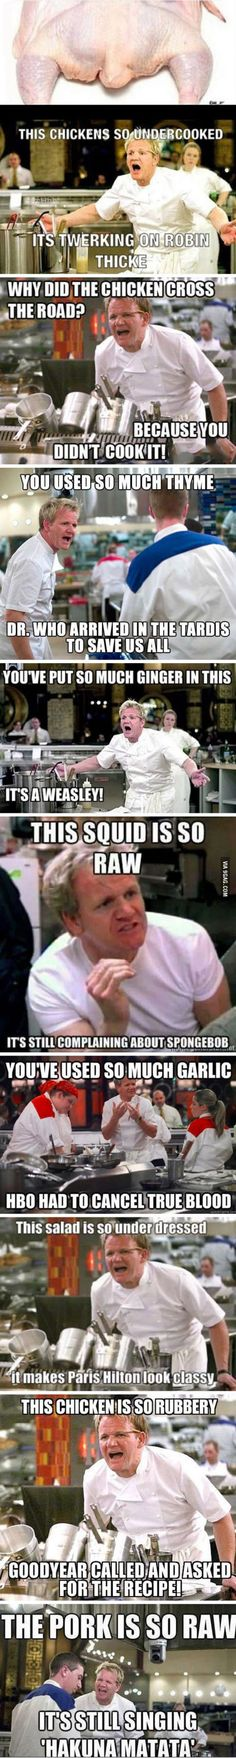 Gordon Ramsey Jokes